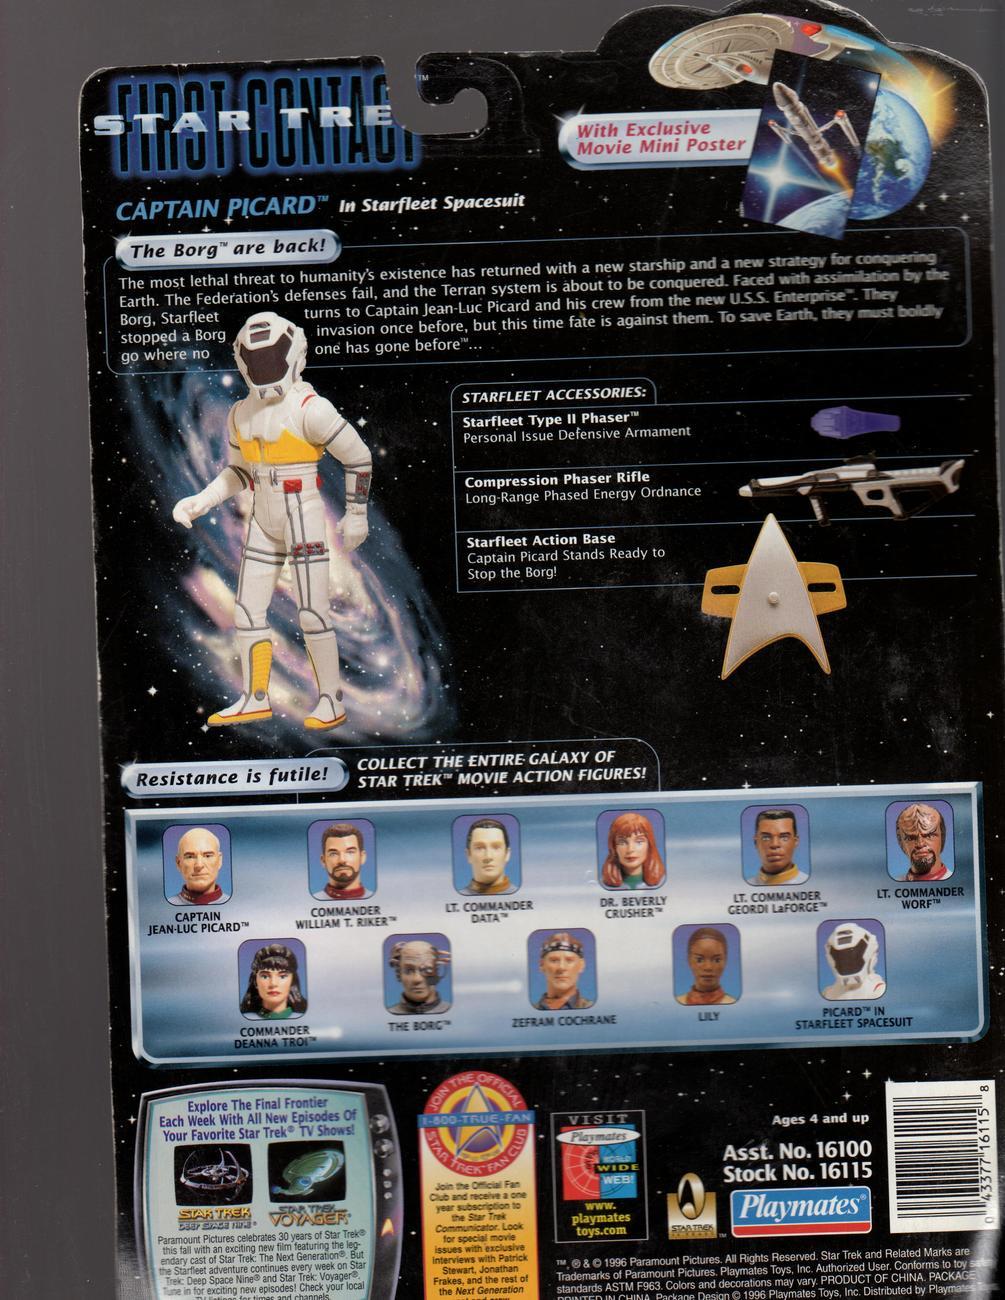 Star Trek - Captain Picard In Starfleet Spacesuit -Star Trek First Contact